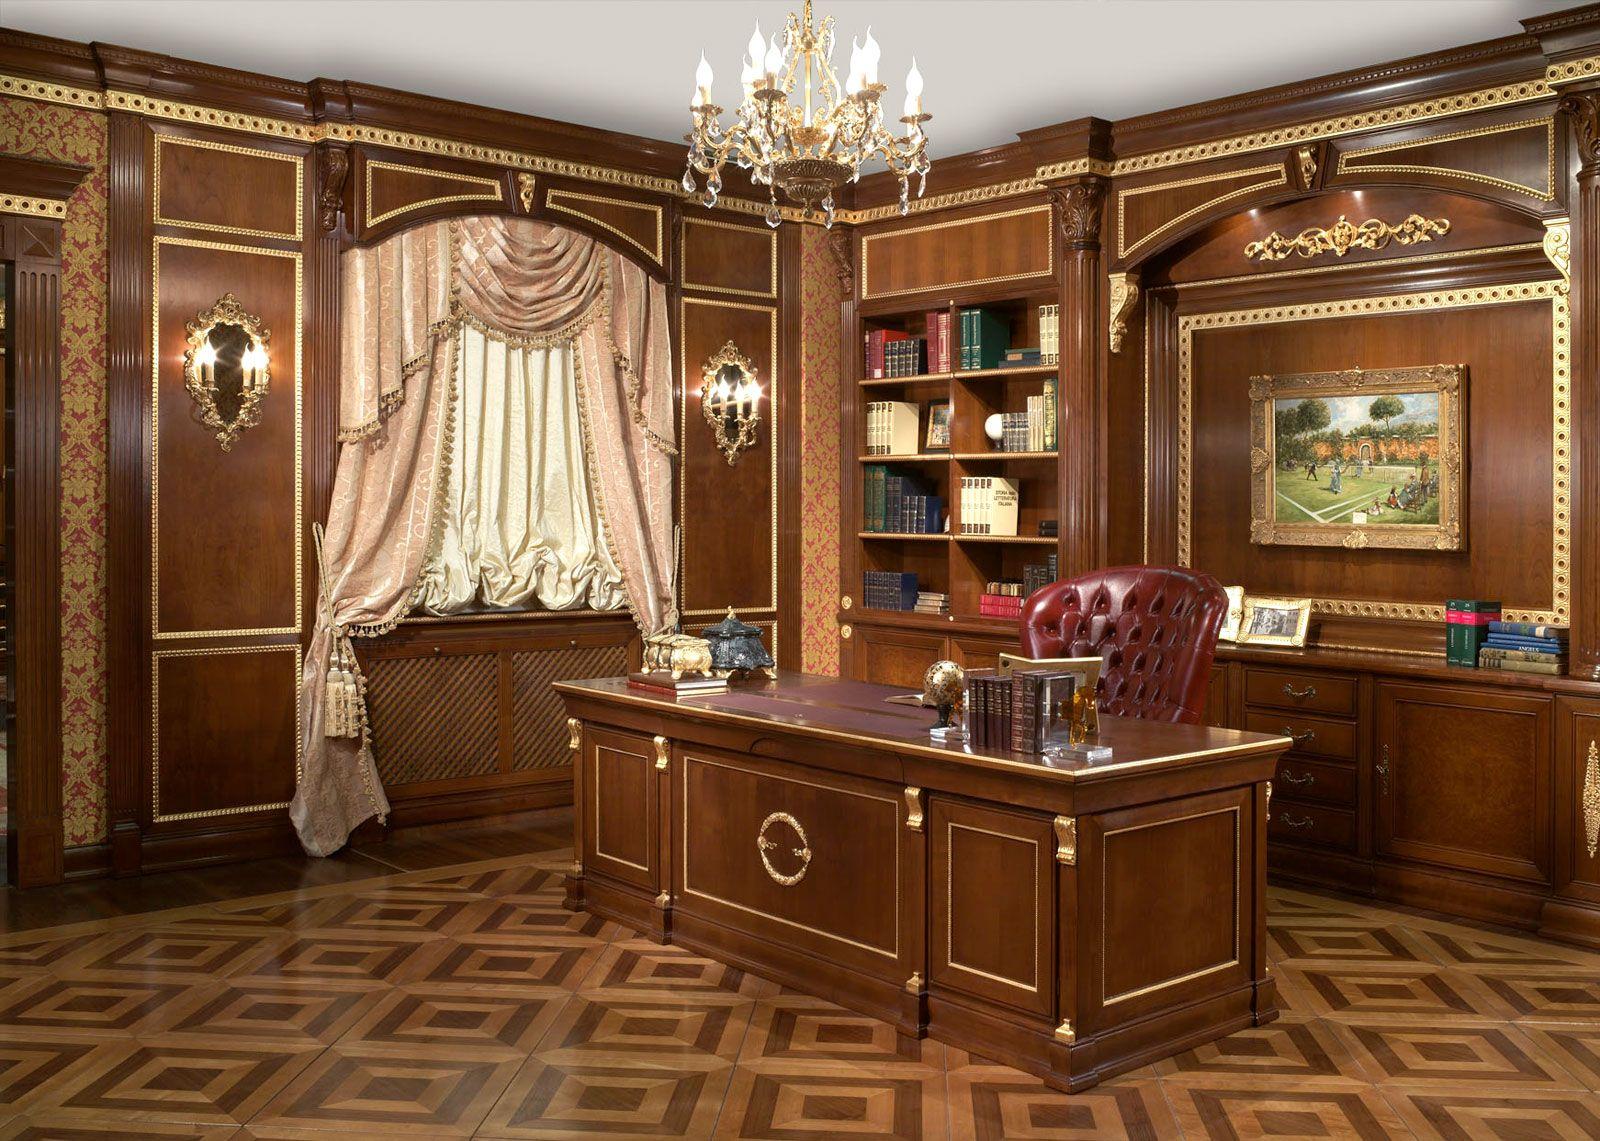 Luxury Office Furniture Office Furniture Luxury Office Chairs Luxury Office Furniture Classic Home Office Furniture Home Office Furniture Design